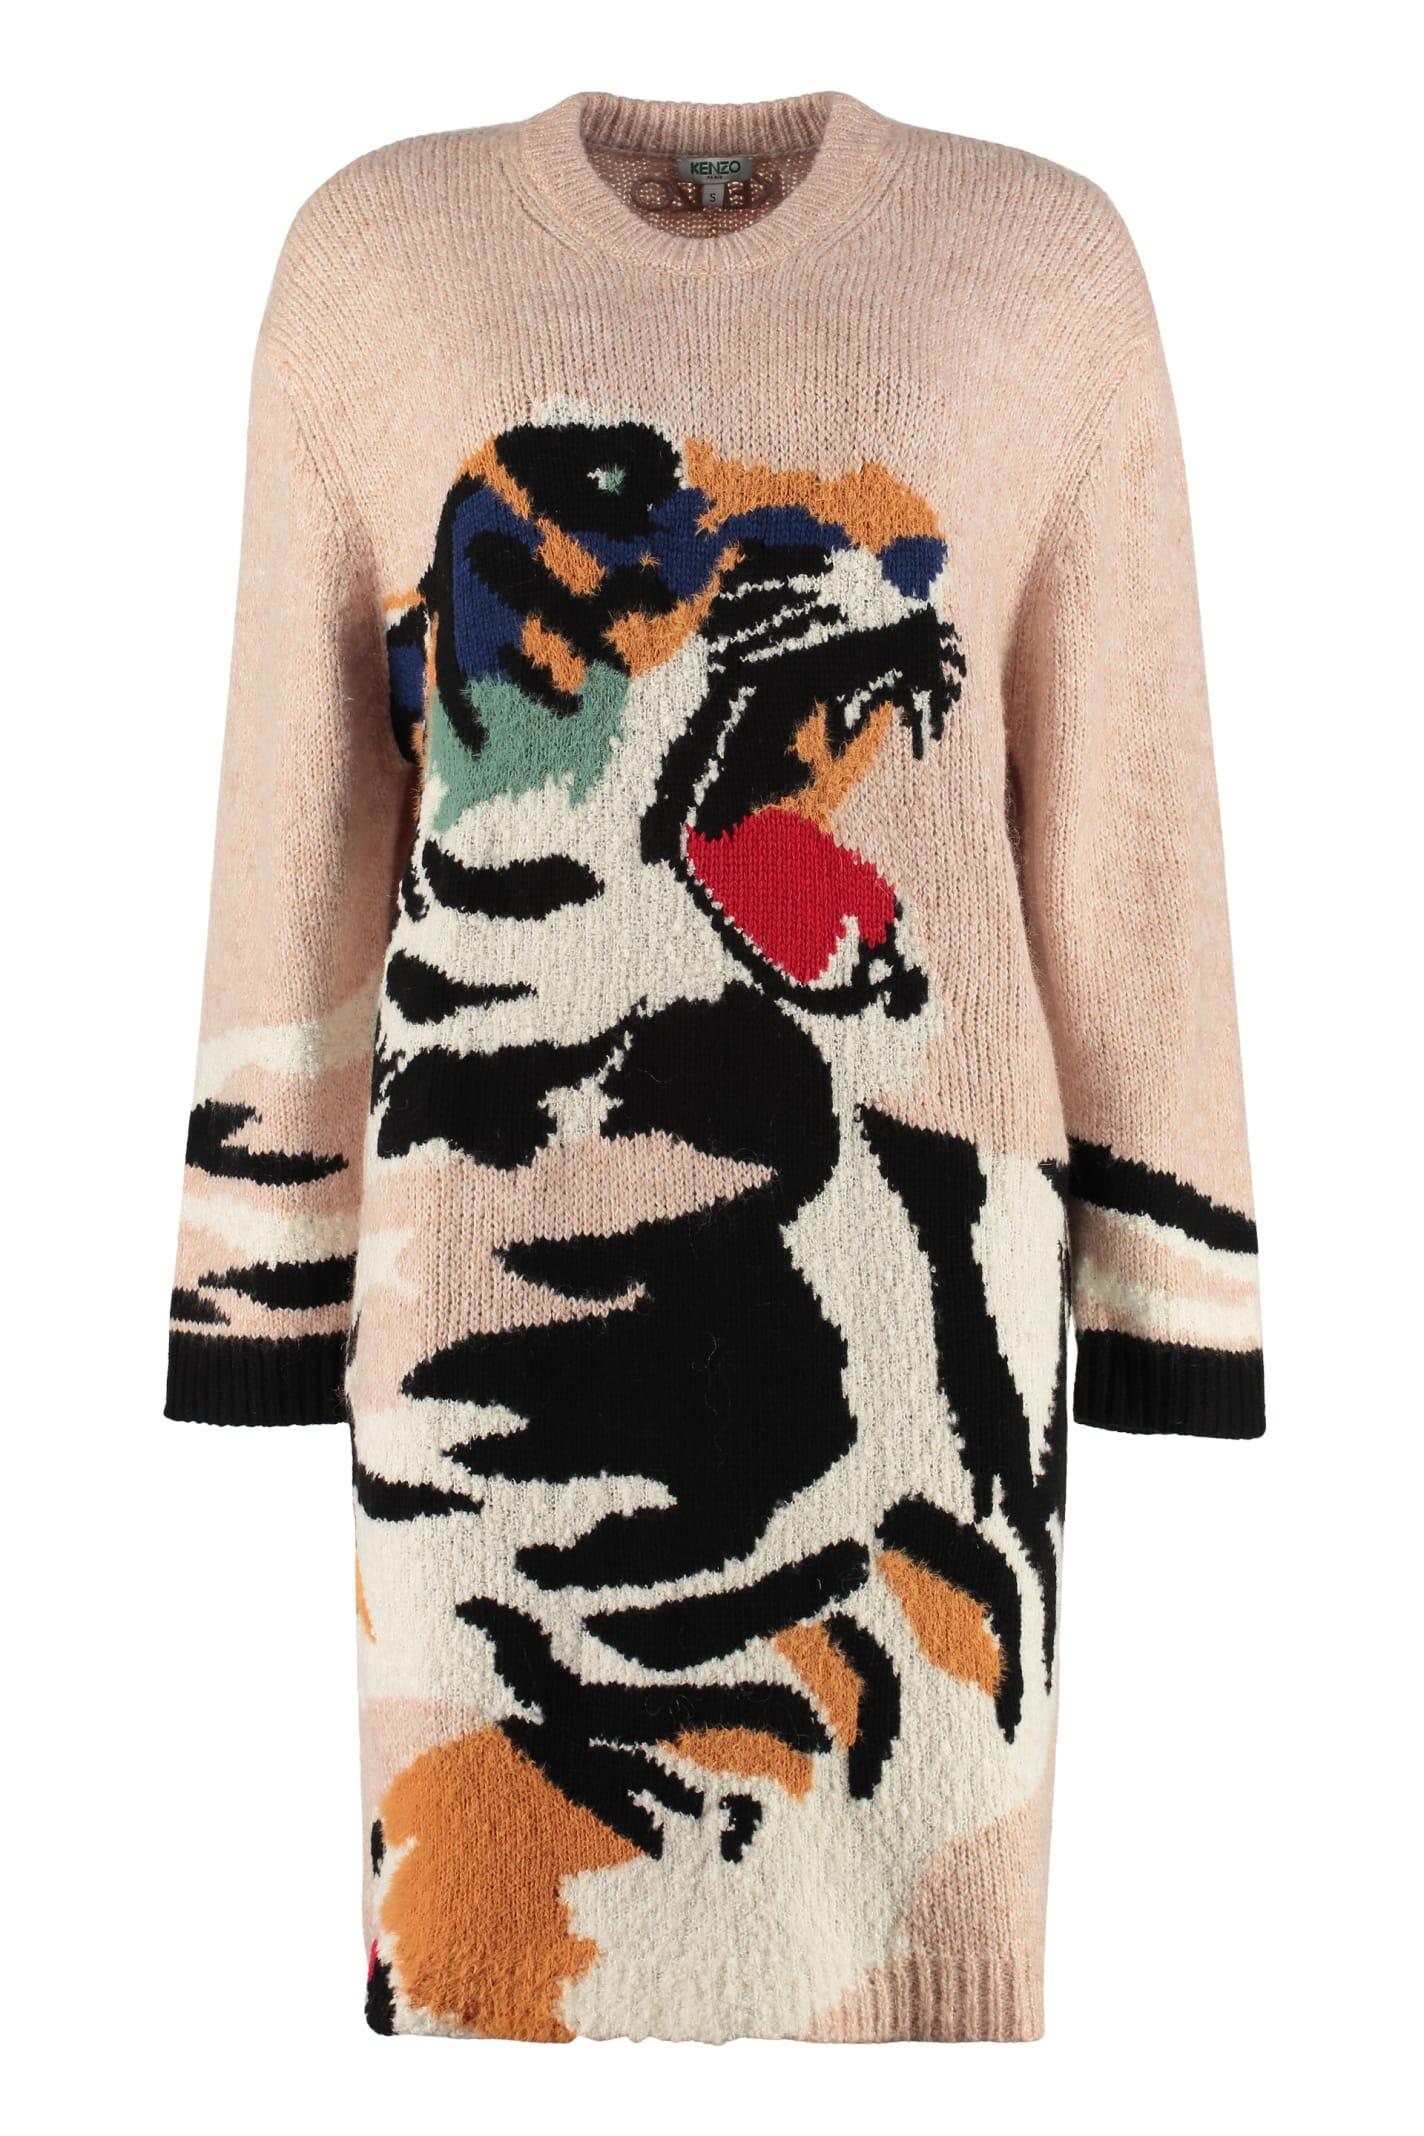 Kenzo Intarsia Sweater-dress